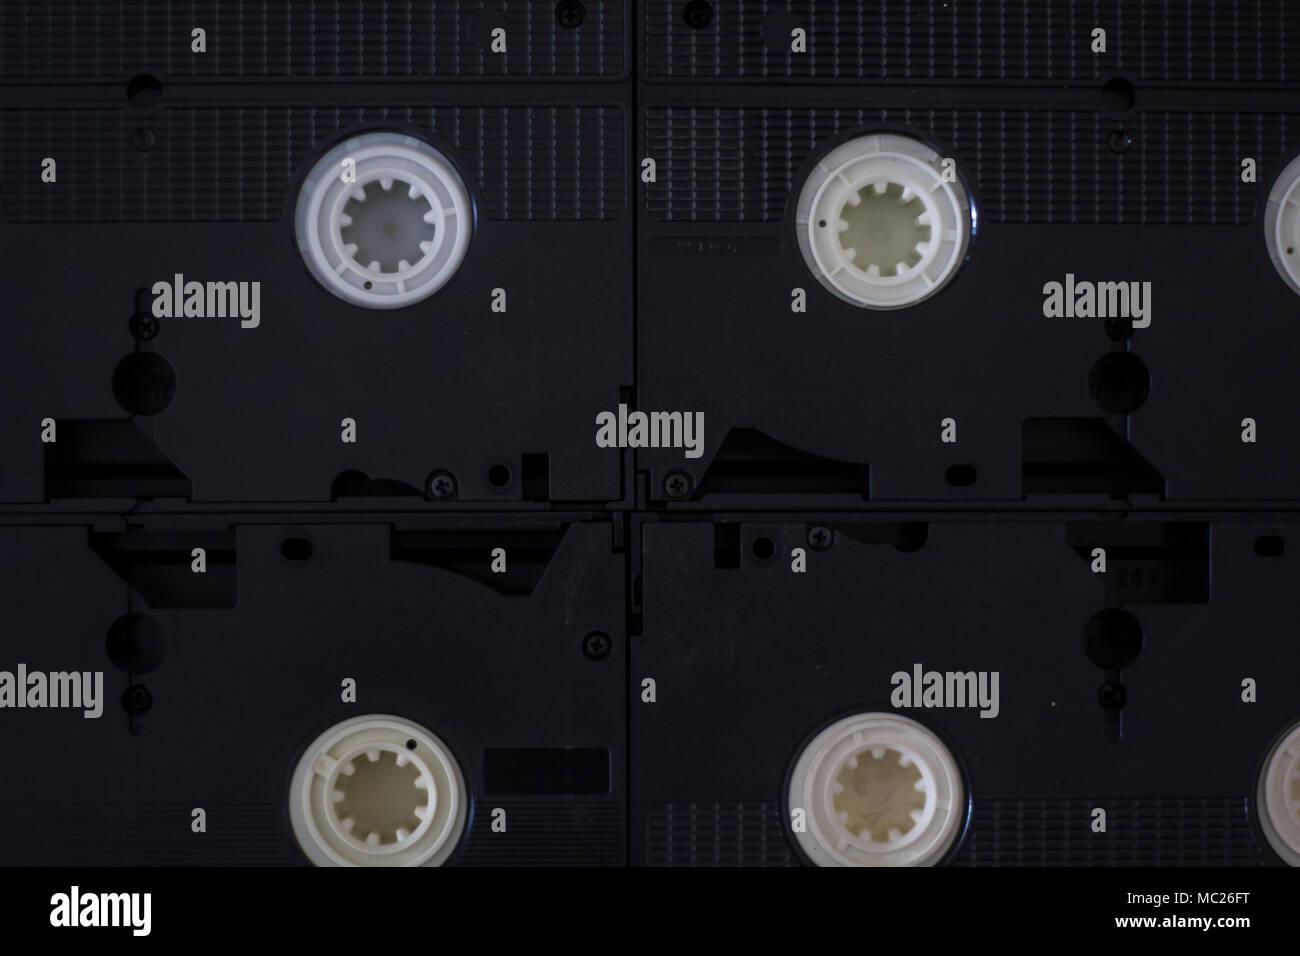 Vhs cassette tapes - Stock Image